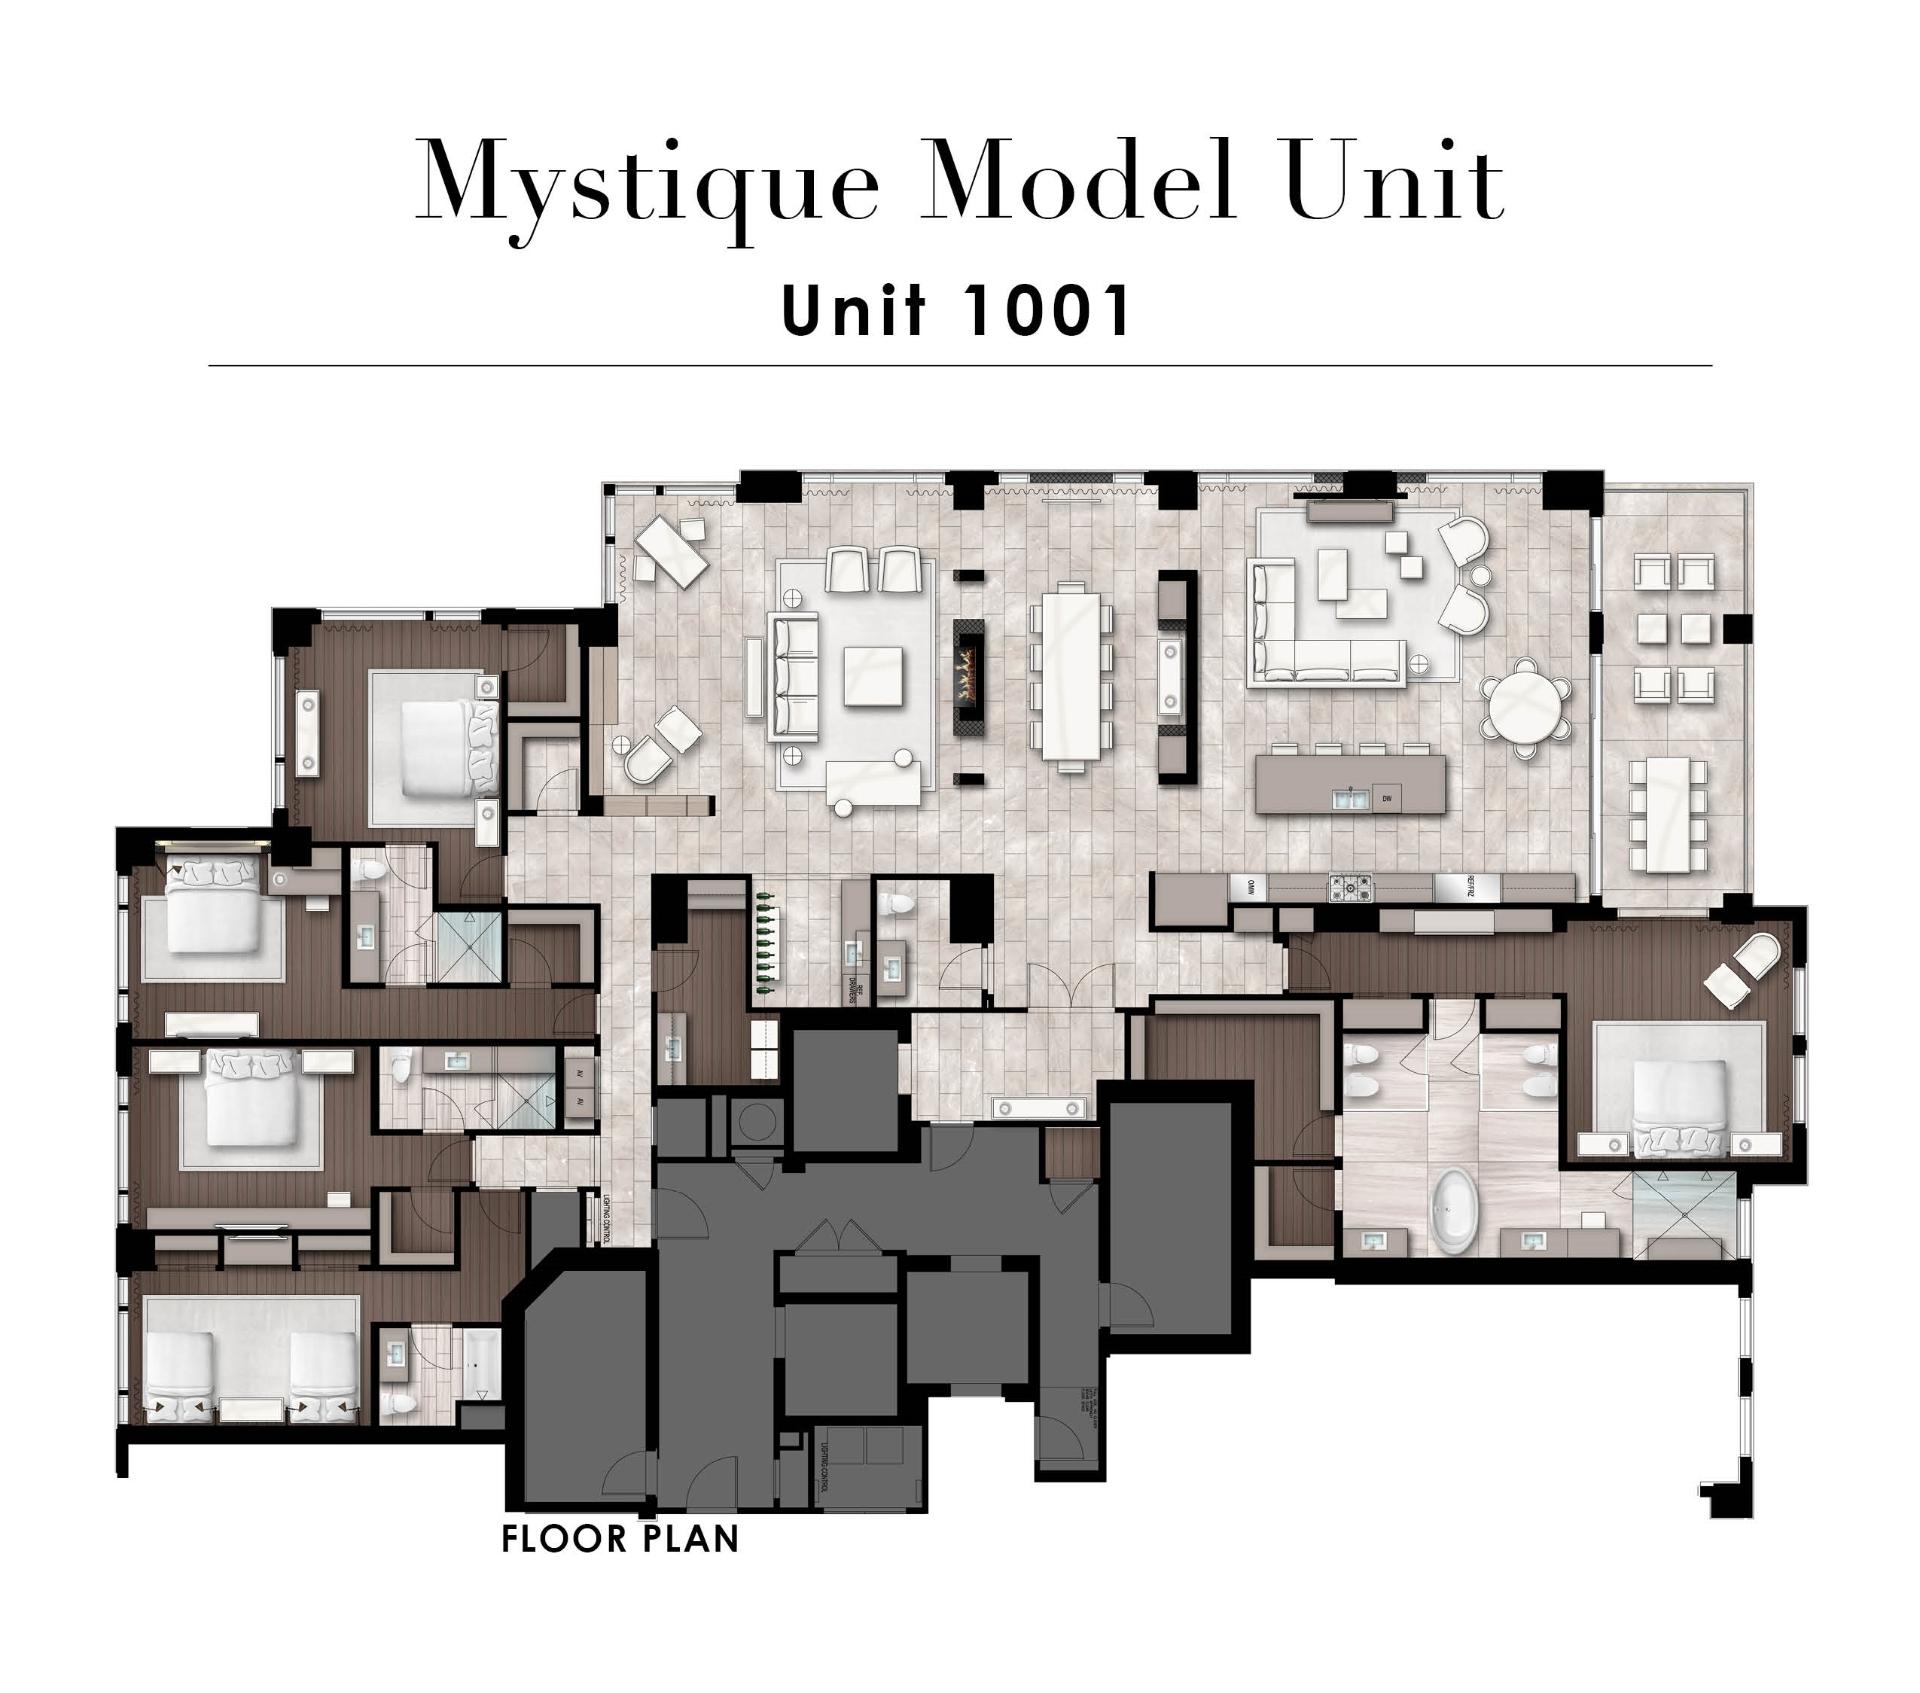 Mystique model unit